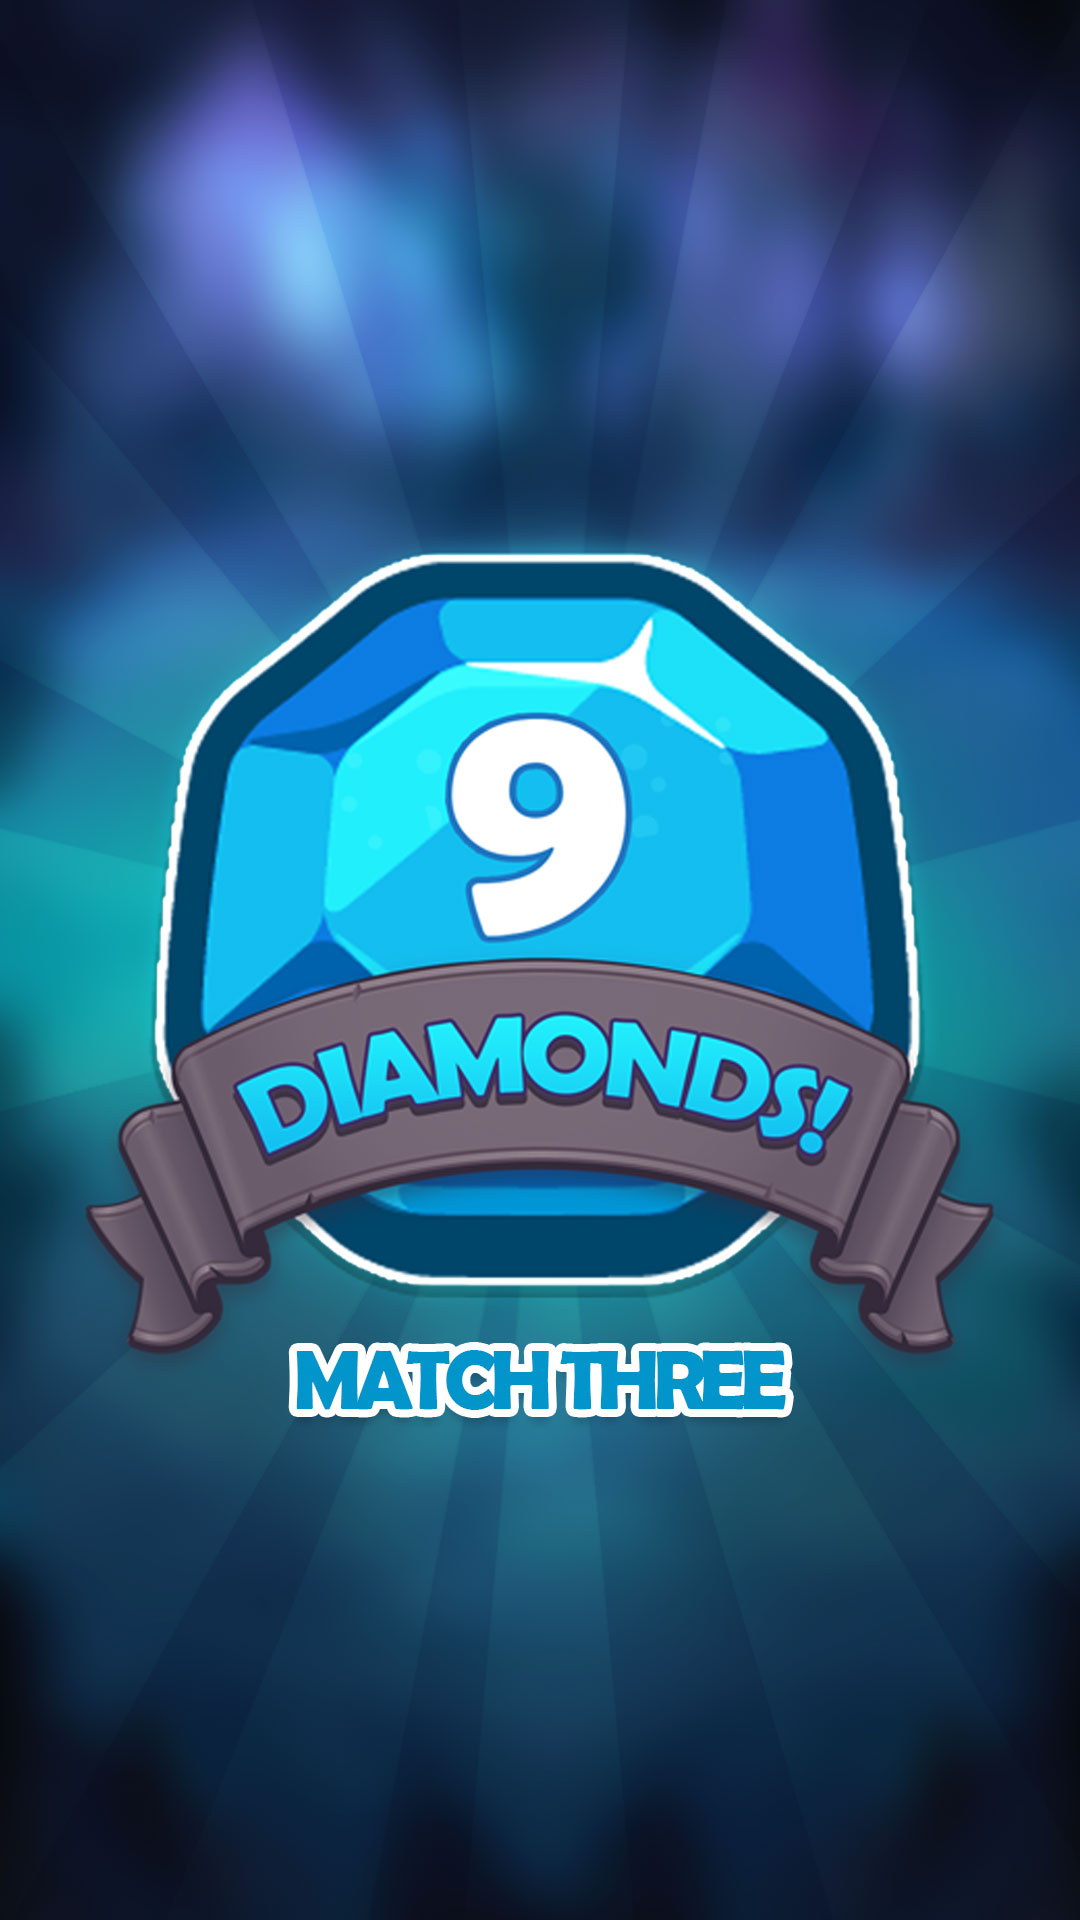 9Diamonds - Match 3